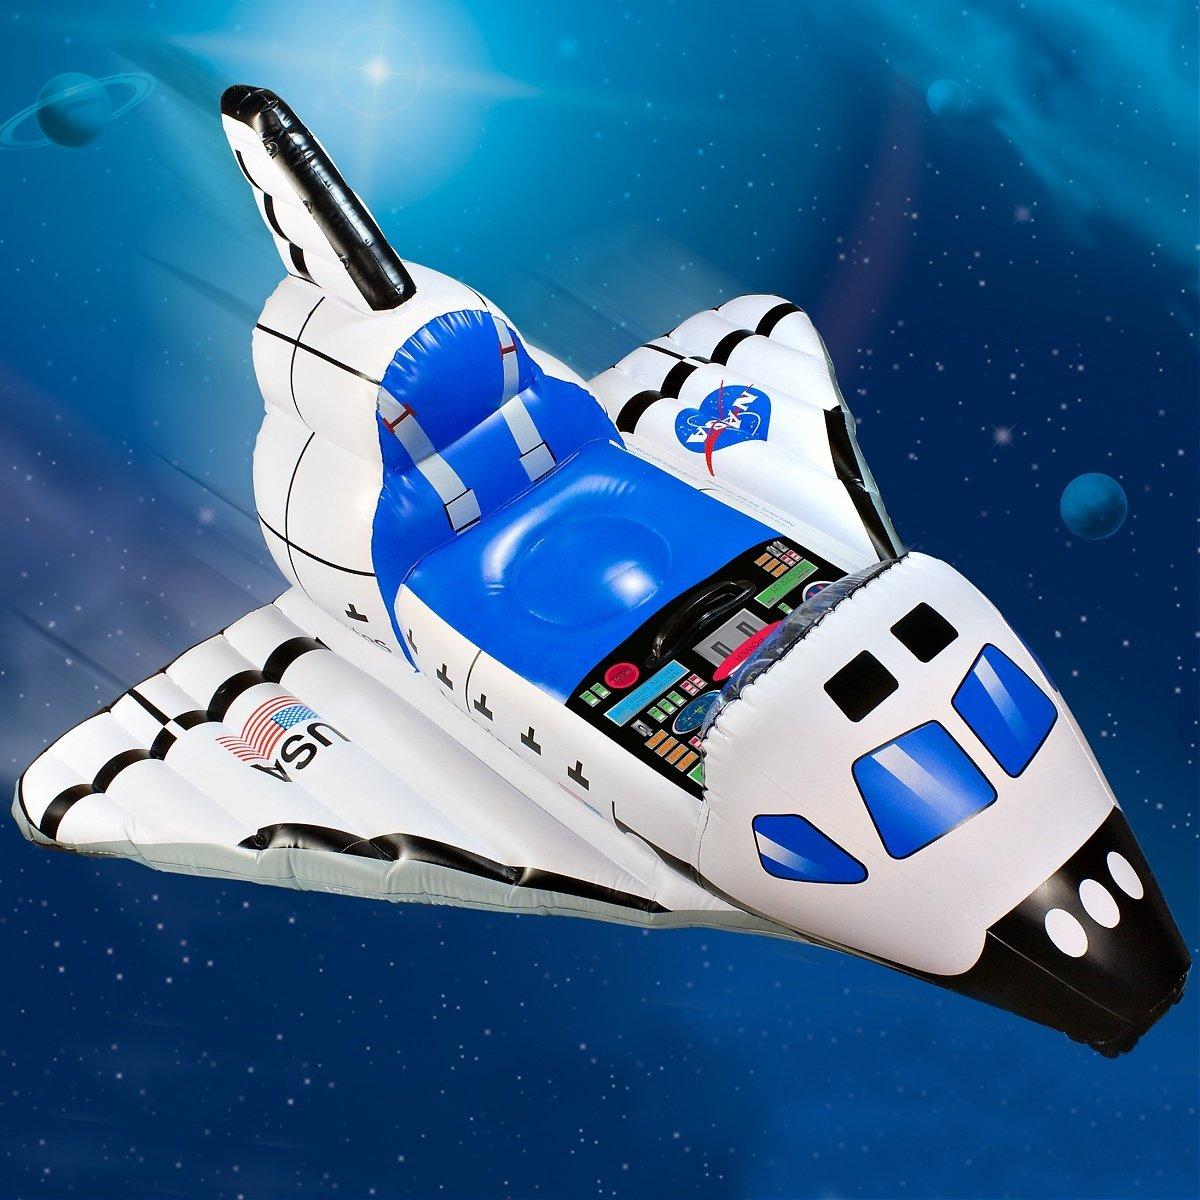 Aeromax Jr. Space Explorer Kind Inflatable Space Shuttle One-Größe